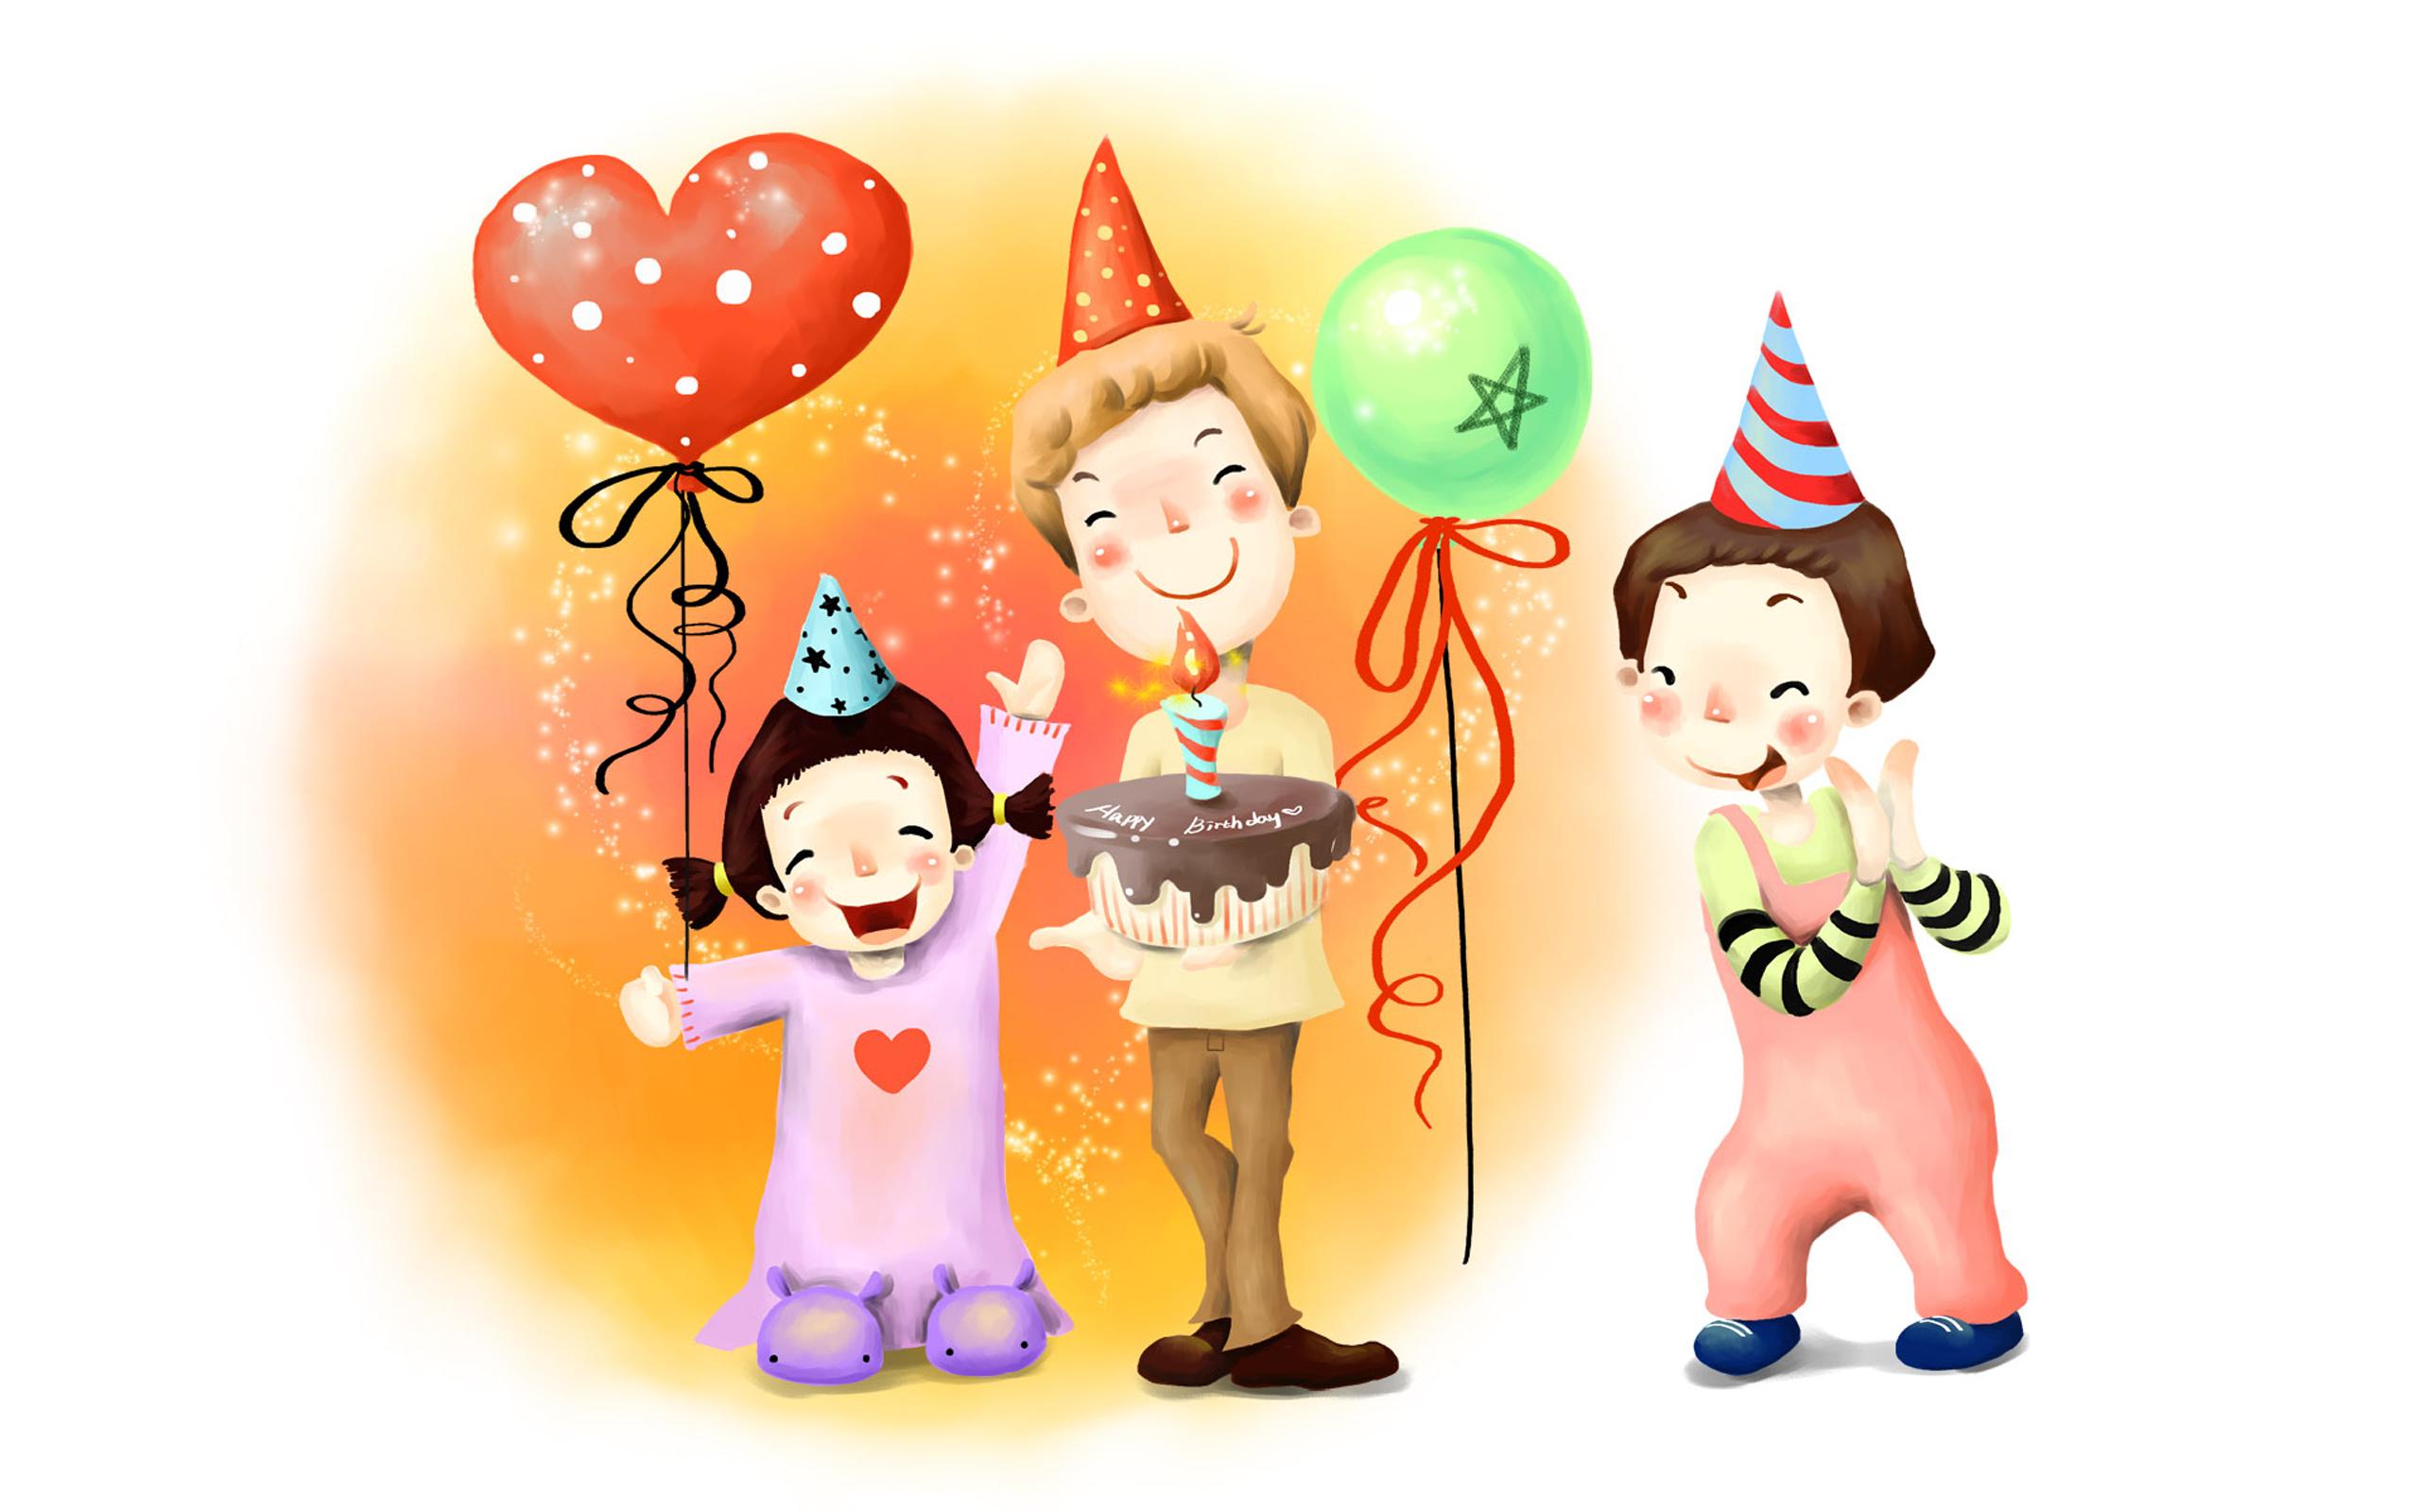 funny cartoons birthday 21 desktop wallpaper - funnypicture